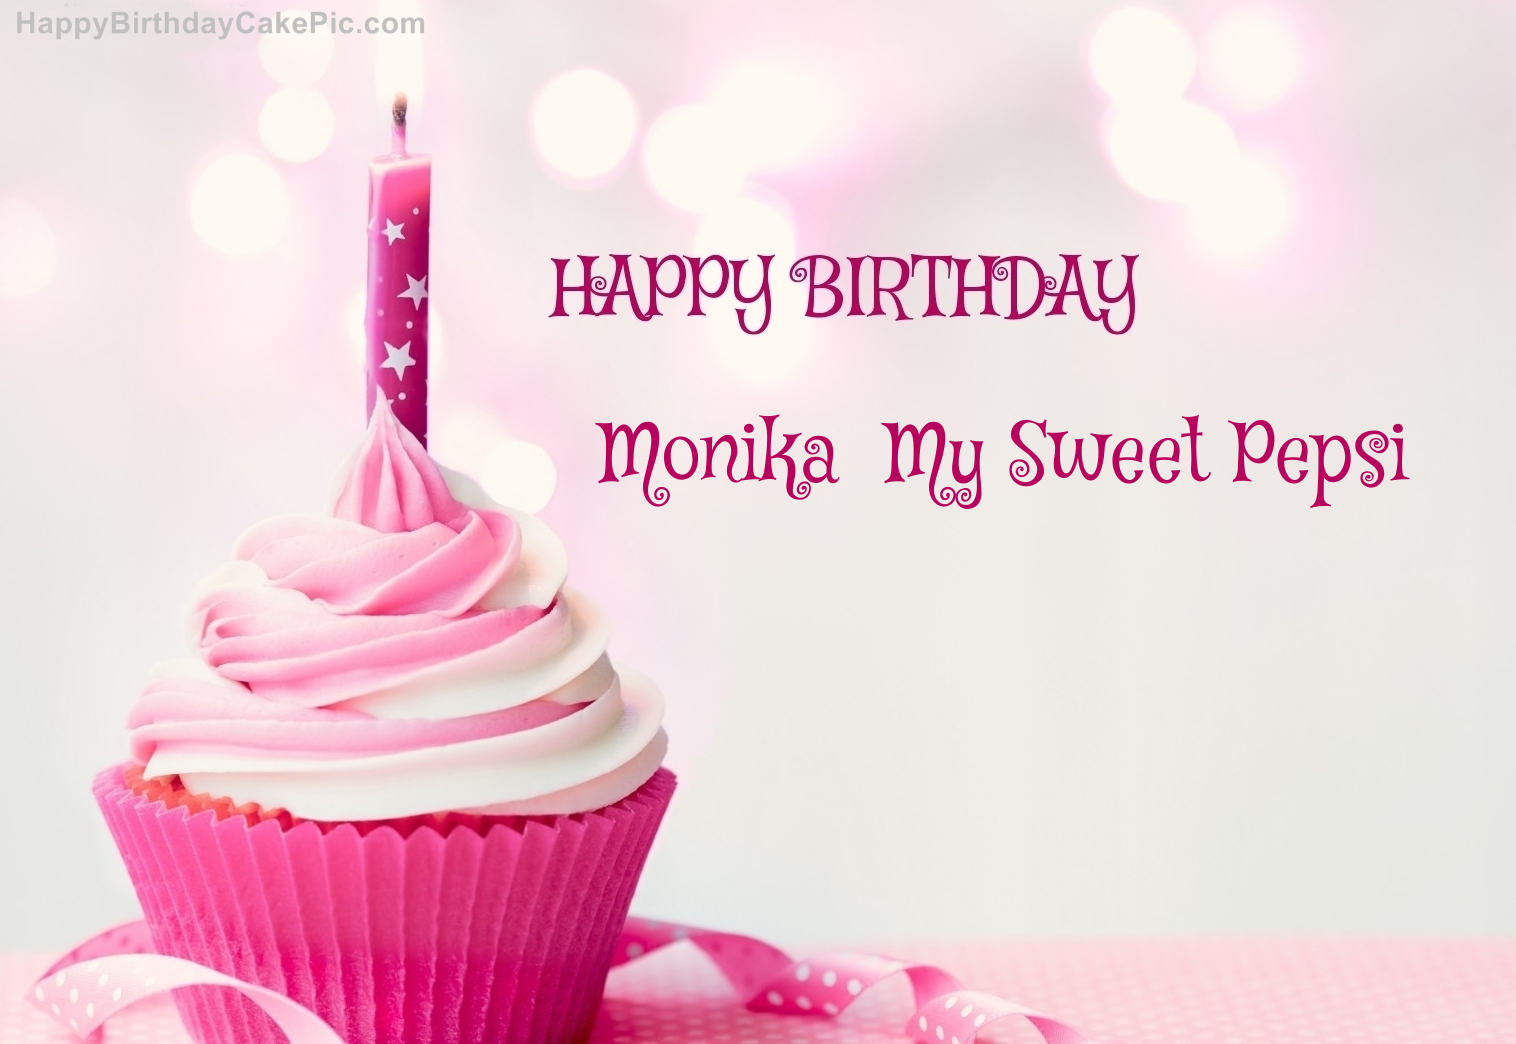 Fantastic Wallpaper Name Monika - happy-birthday-cupcake-candle-pink-picture-for-Monika%20%20My%20Sweet%20Pepsi  Graphic_999927.jpg